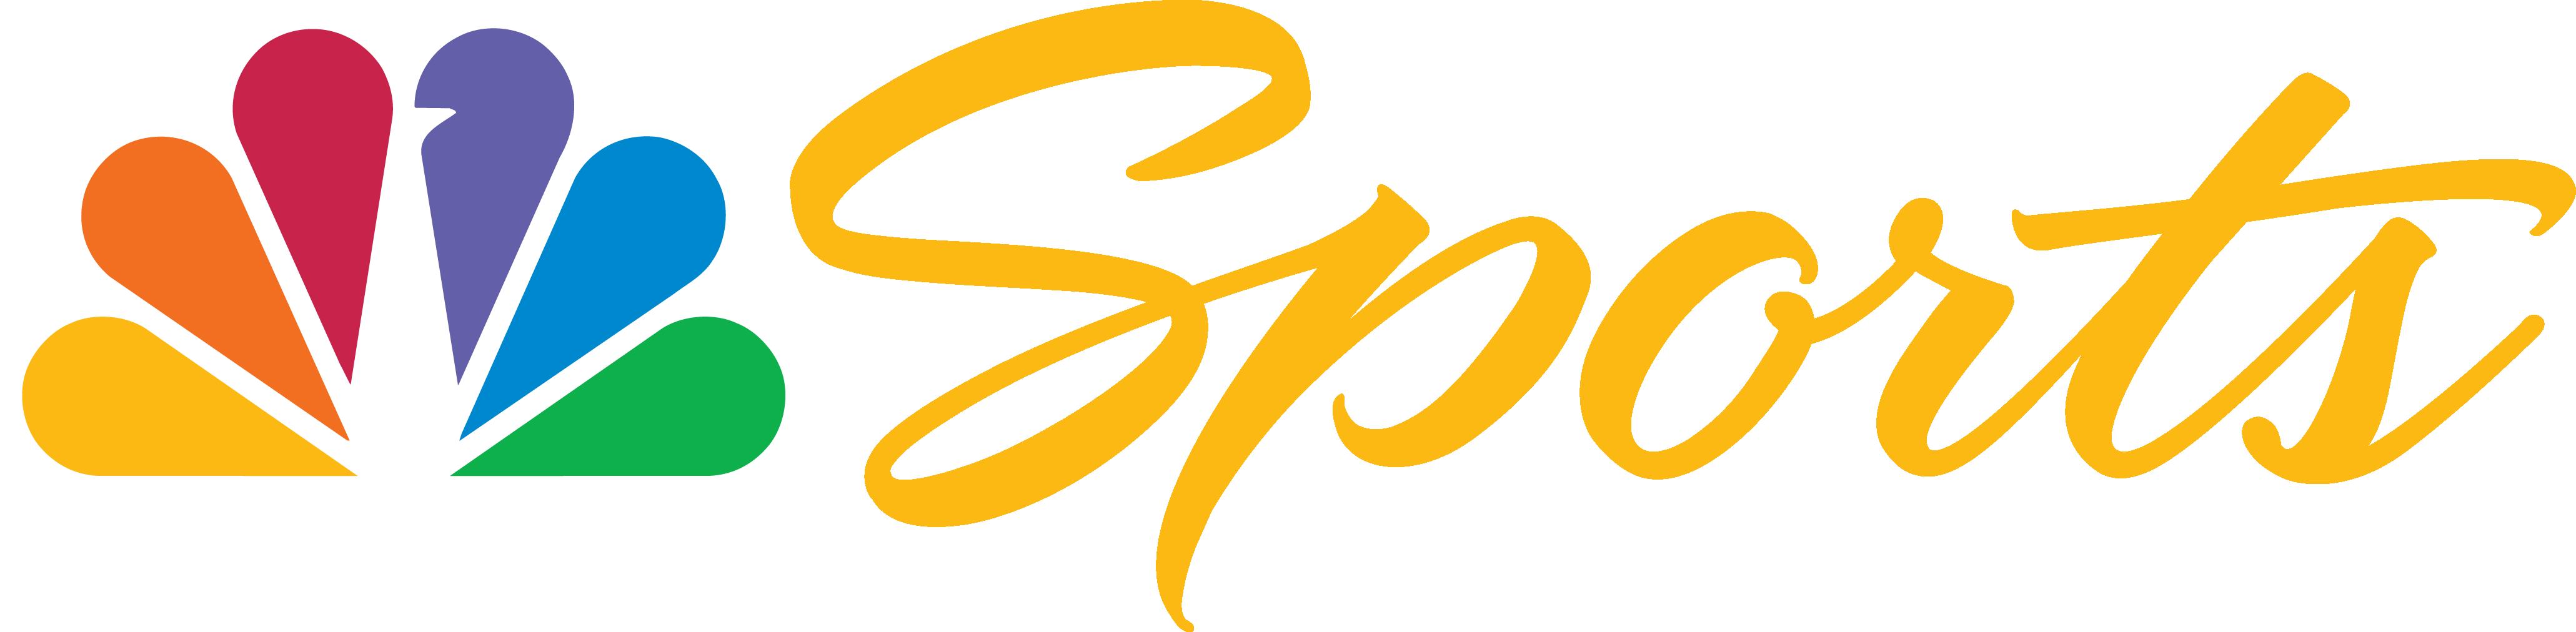 NBC Sports logo links to NBC's website.